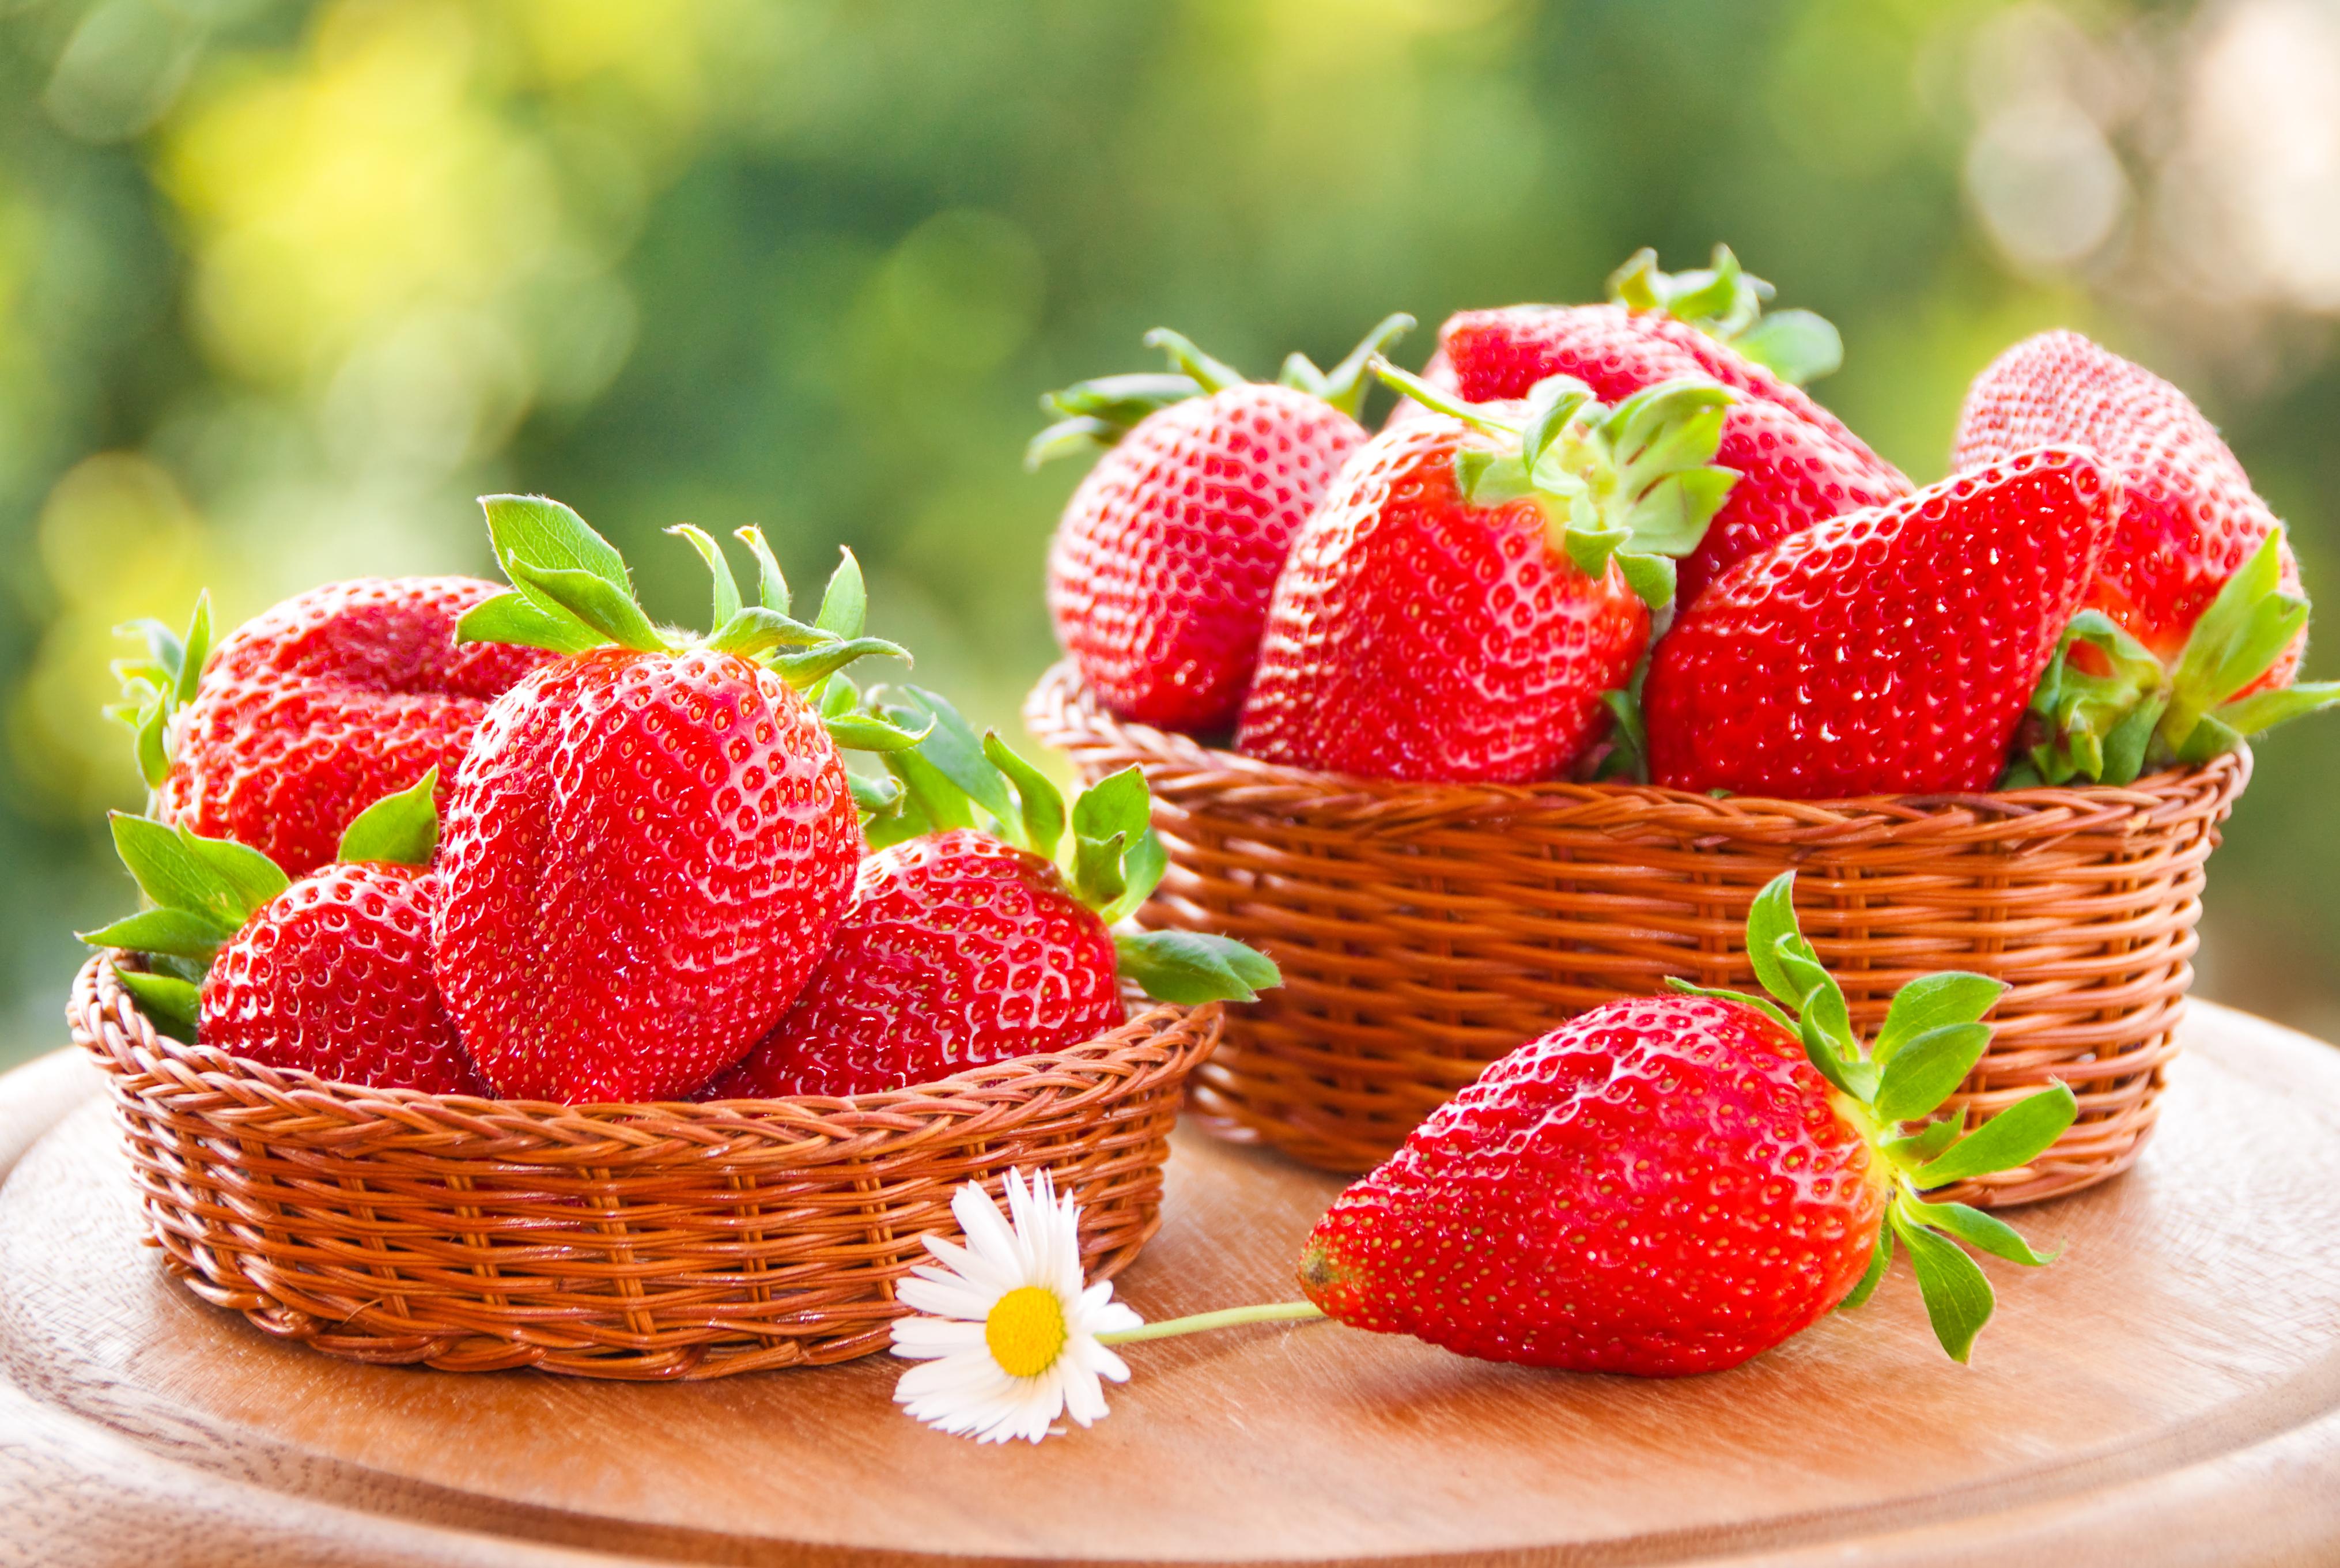 клубника корзина strawberry basket скачать